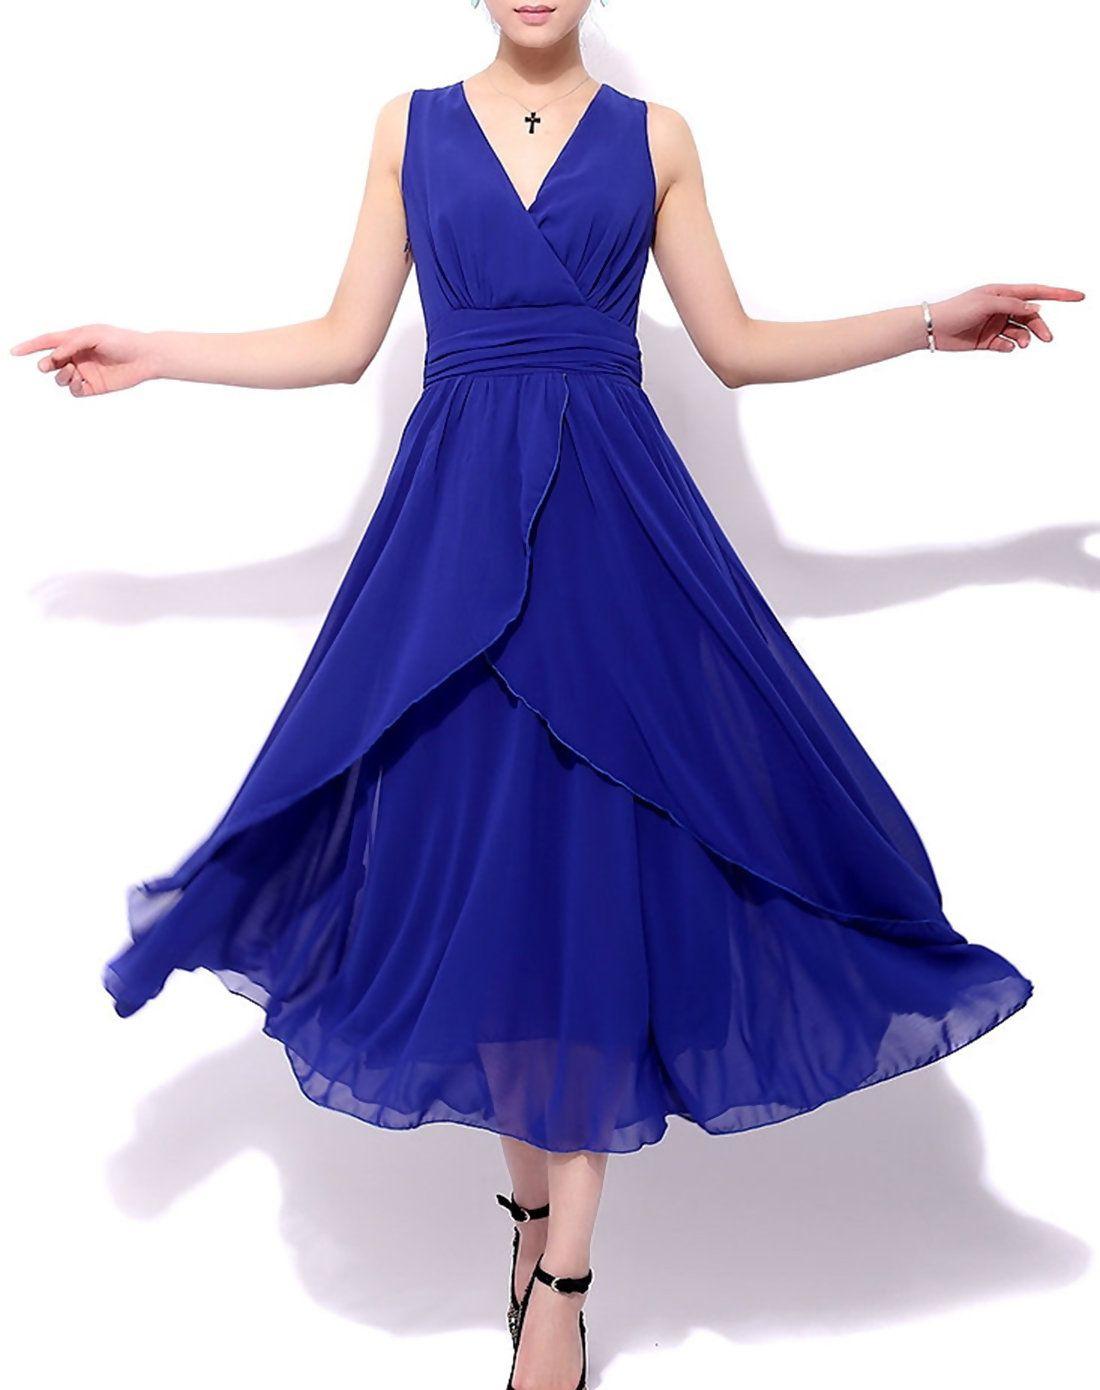 Adorewe vipme skater dresses hzy tempting blue chiffon sleeveless